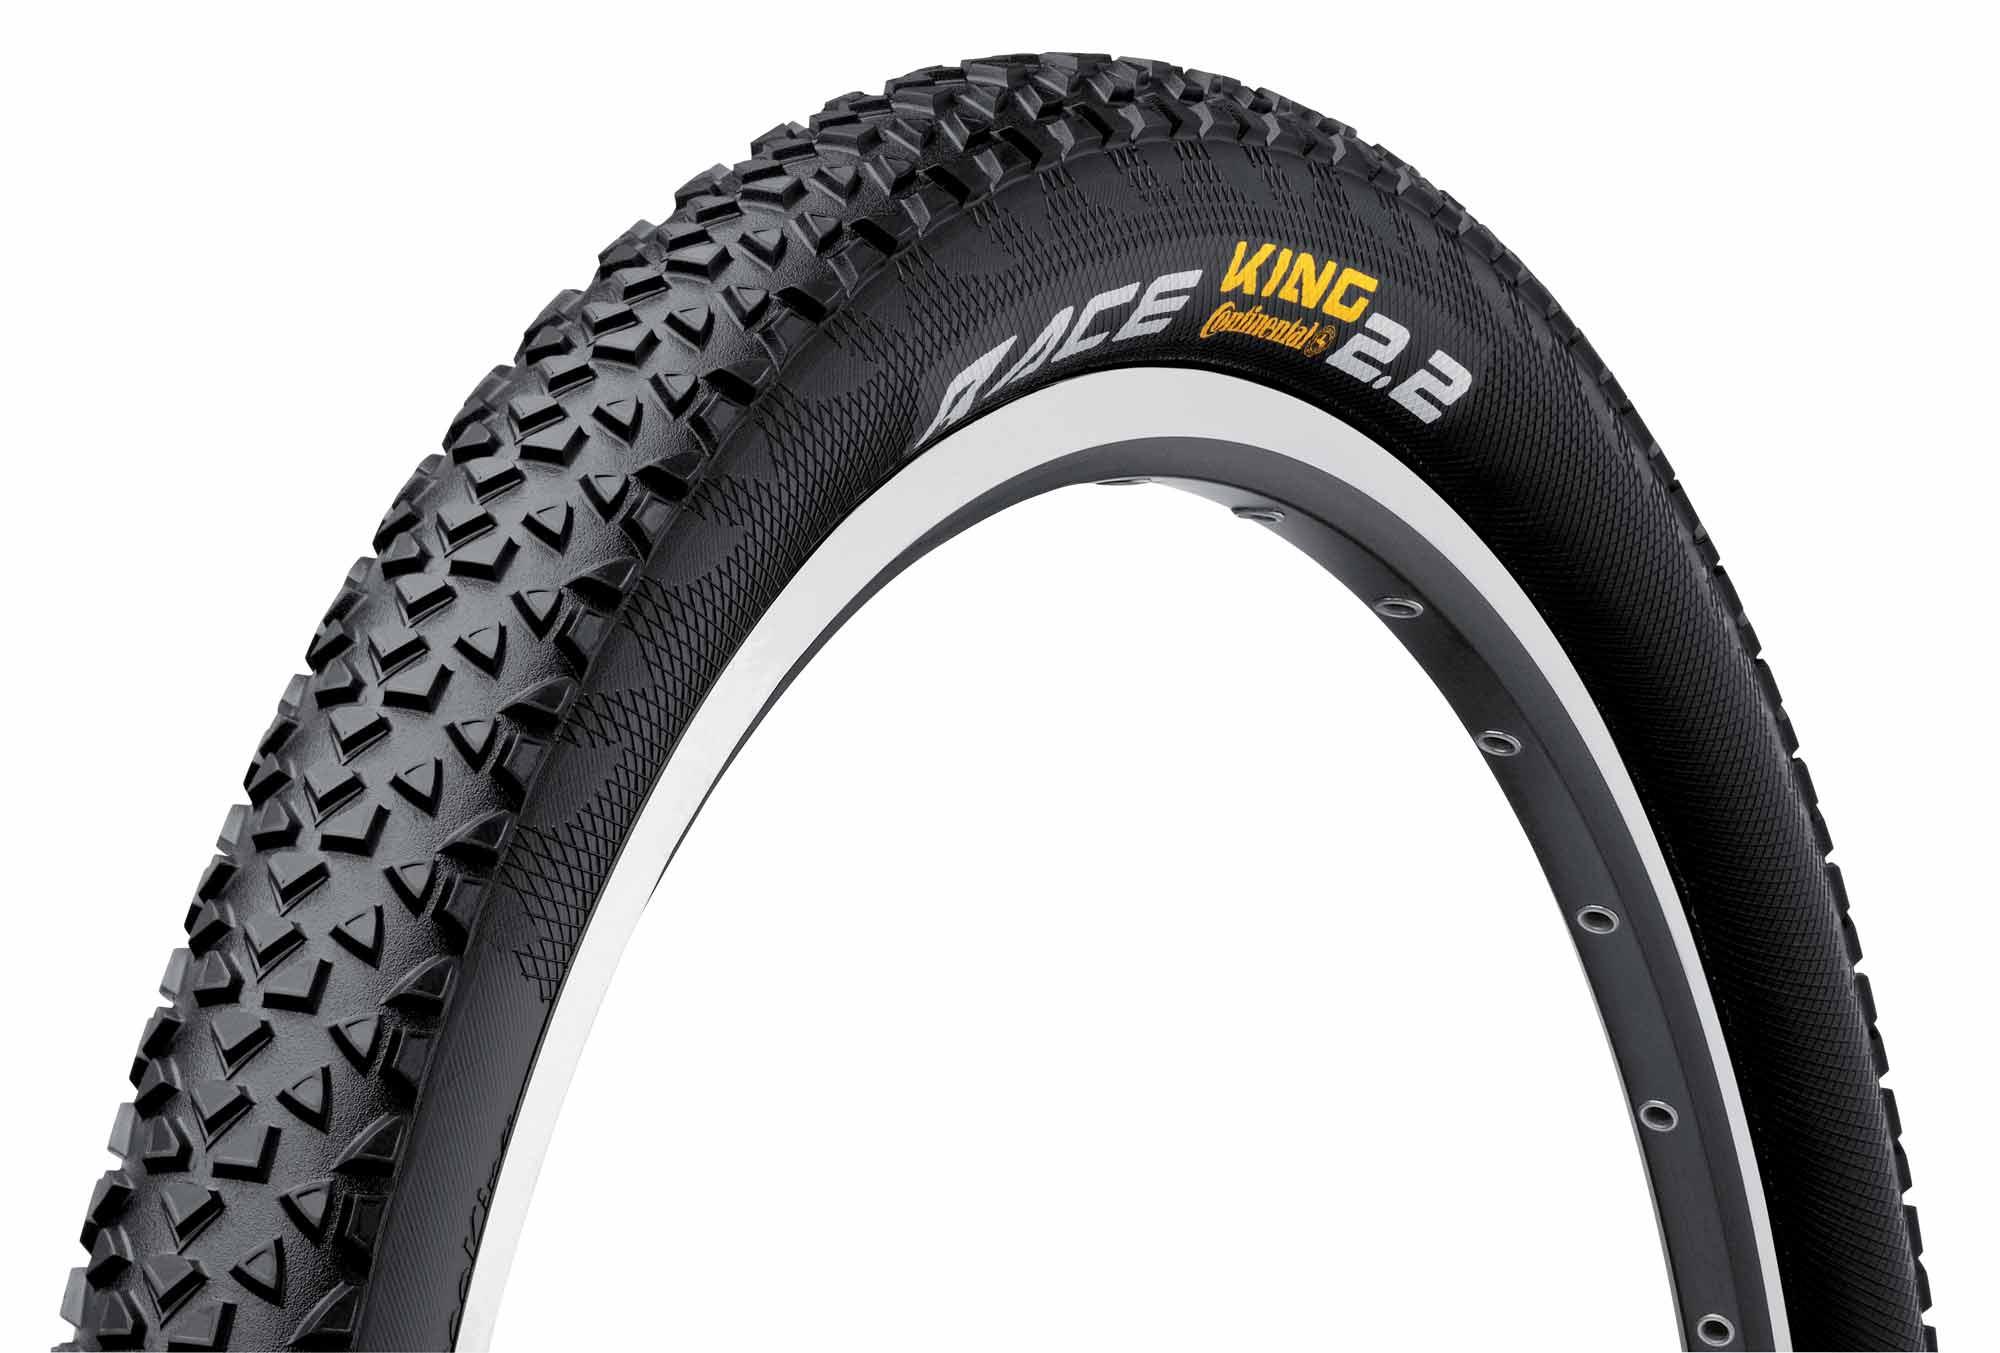 continental pneu race king 26x2 2 tubetype. Black Bedroom Furniture Sets. Home Design Ideas